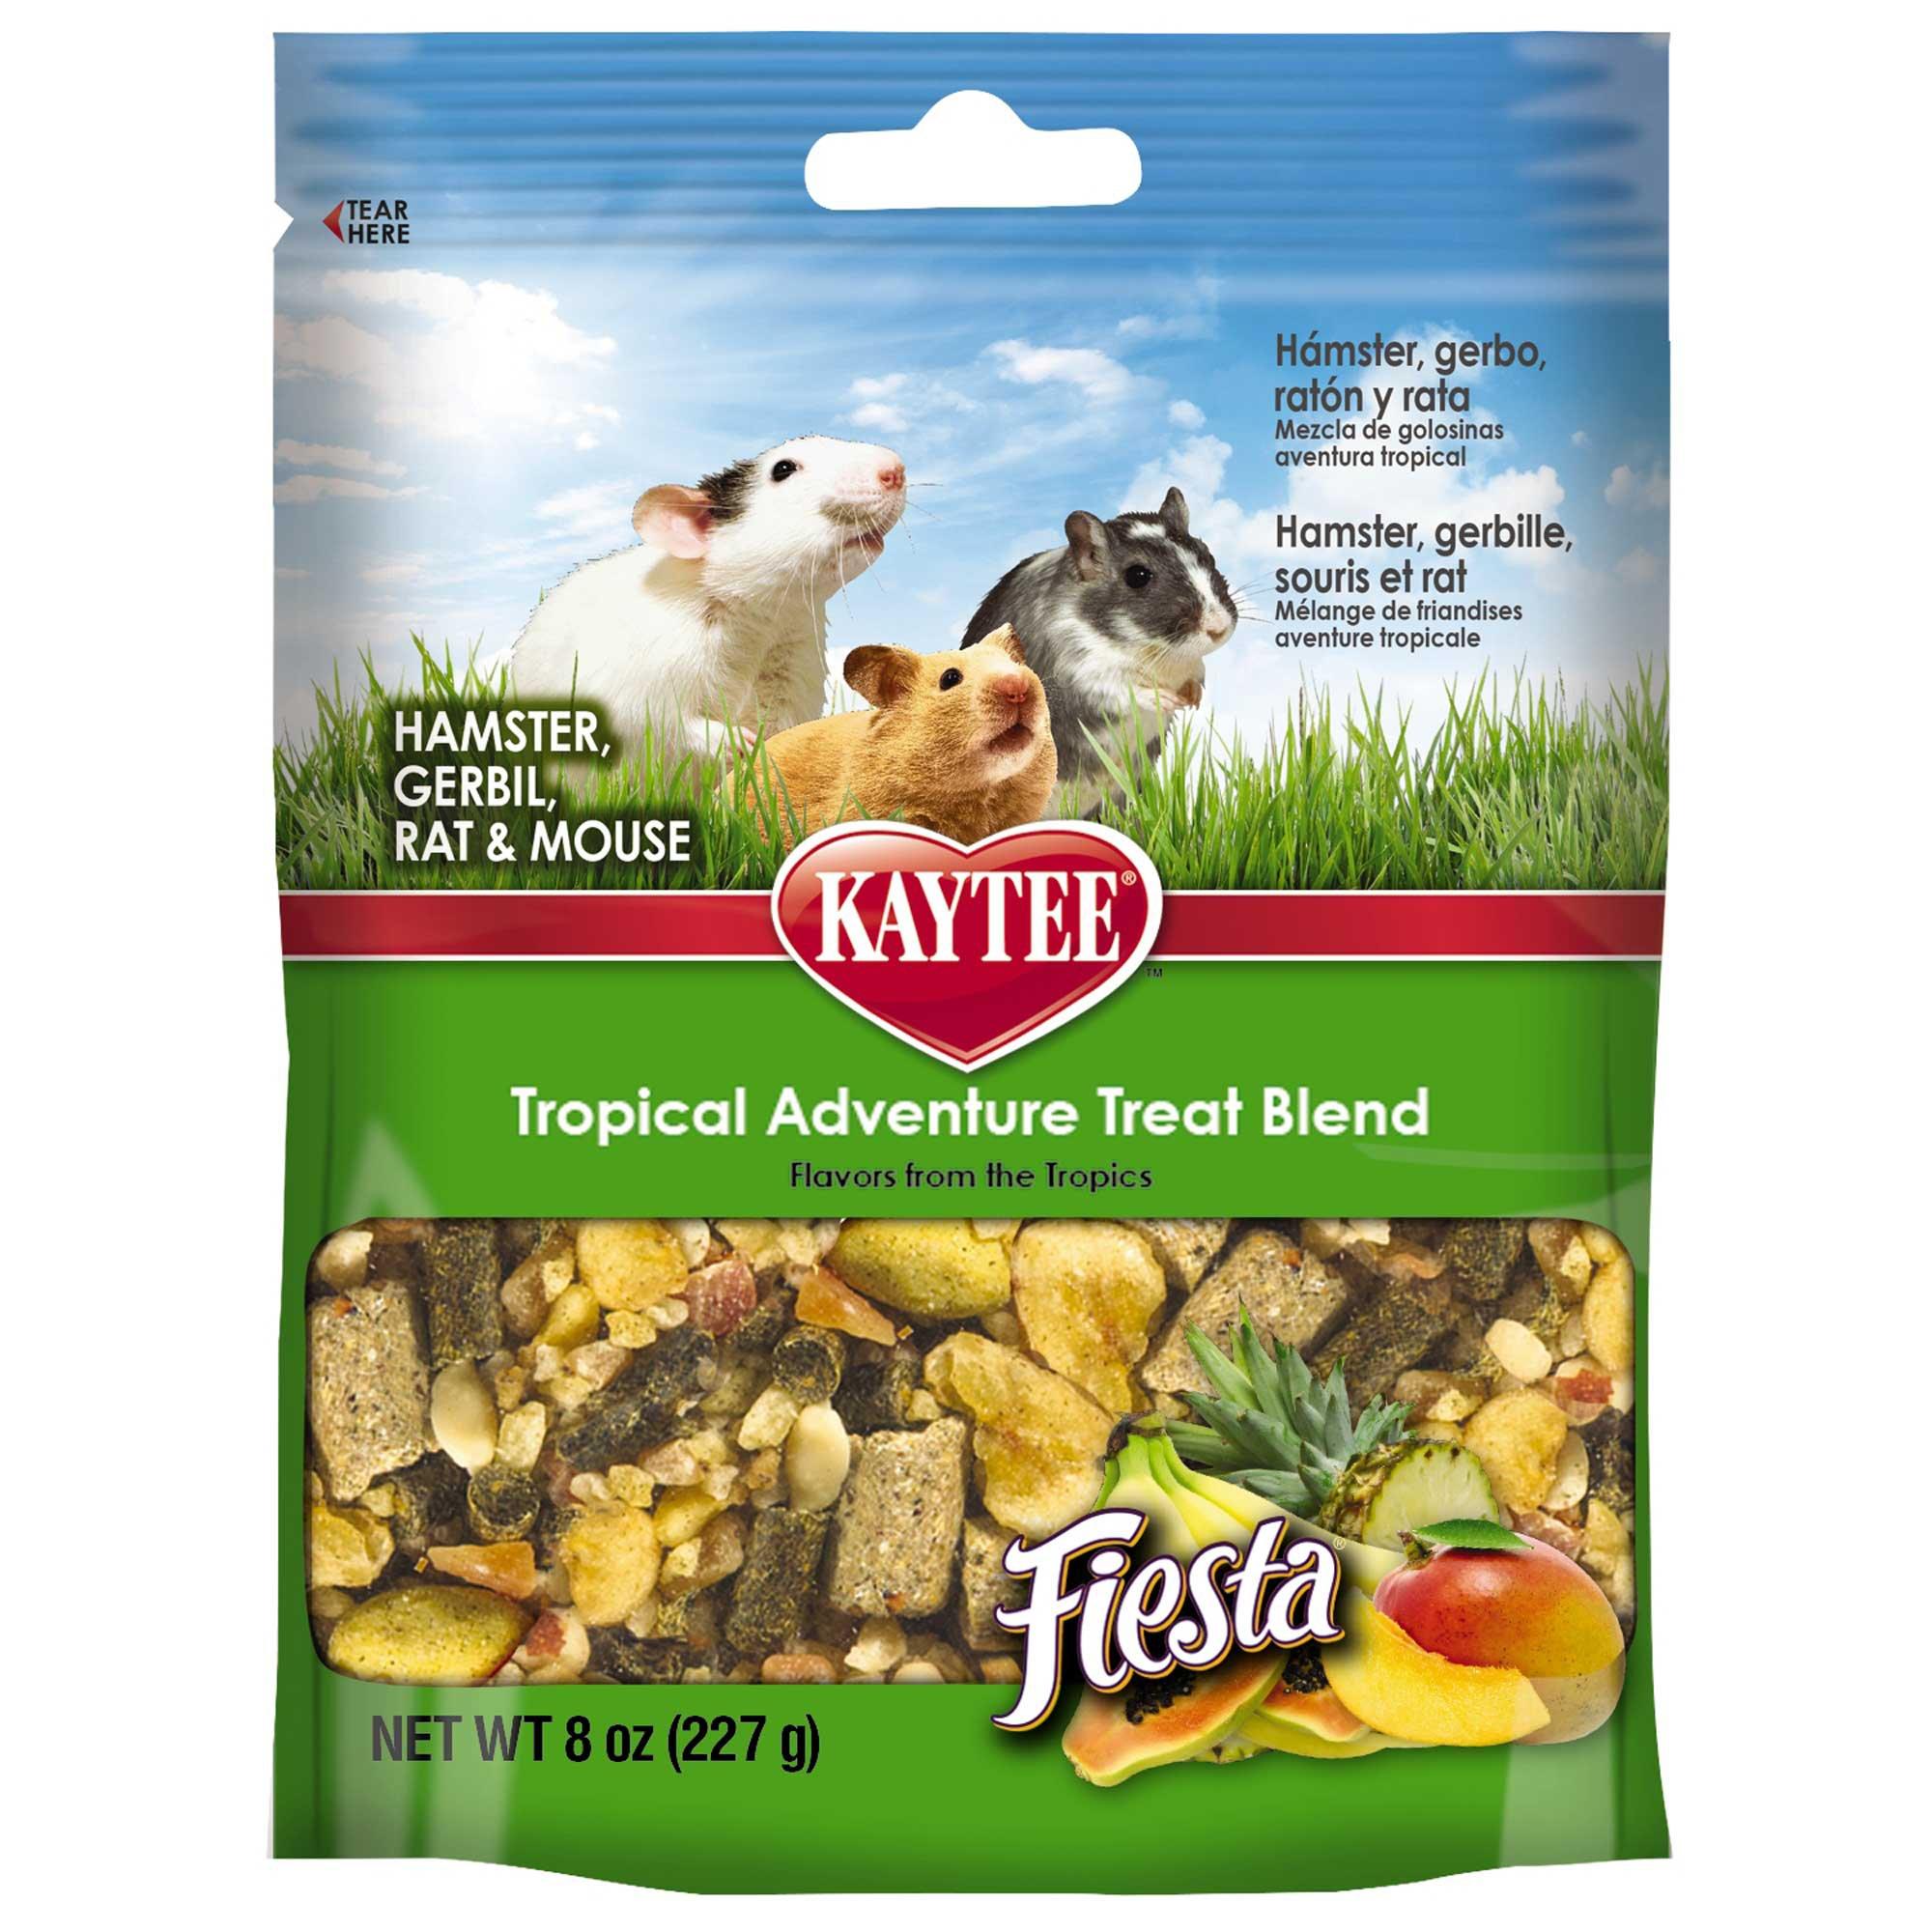 Kaytee Fiesta Tropical Adventure Small Animal Treat